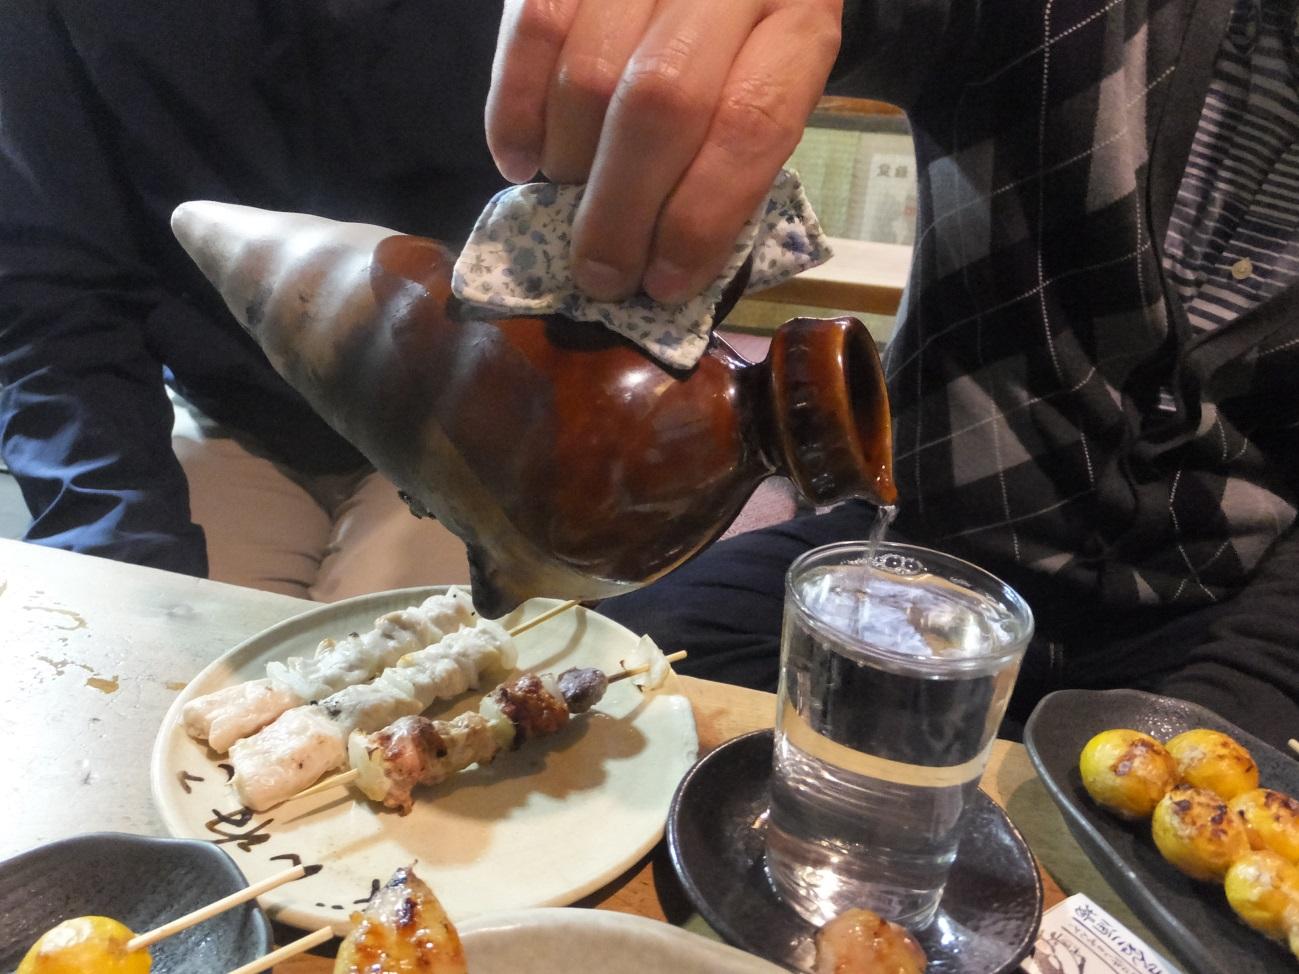 C:\Users\otokoyama\Desktop\「男山を、読む」飲食店訪問記録\ぎんねこ(20180510)\DSCF4187.JPG